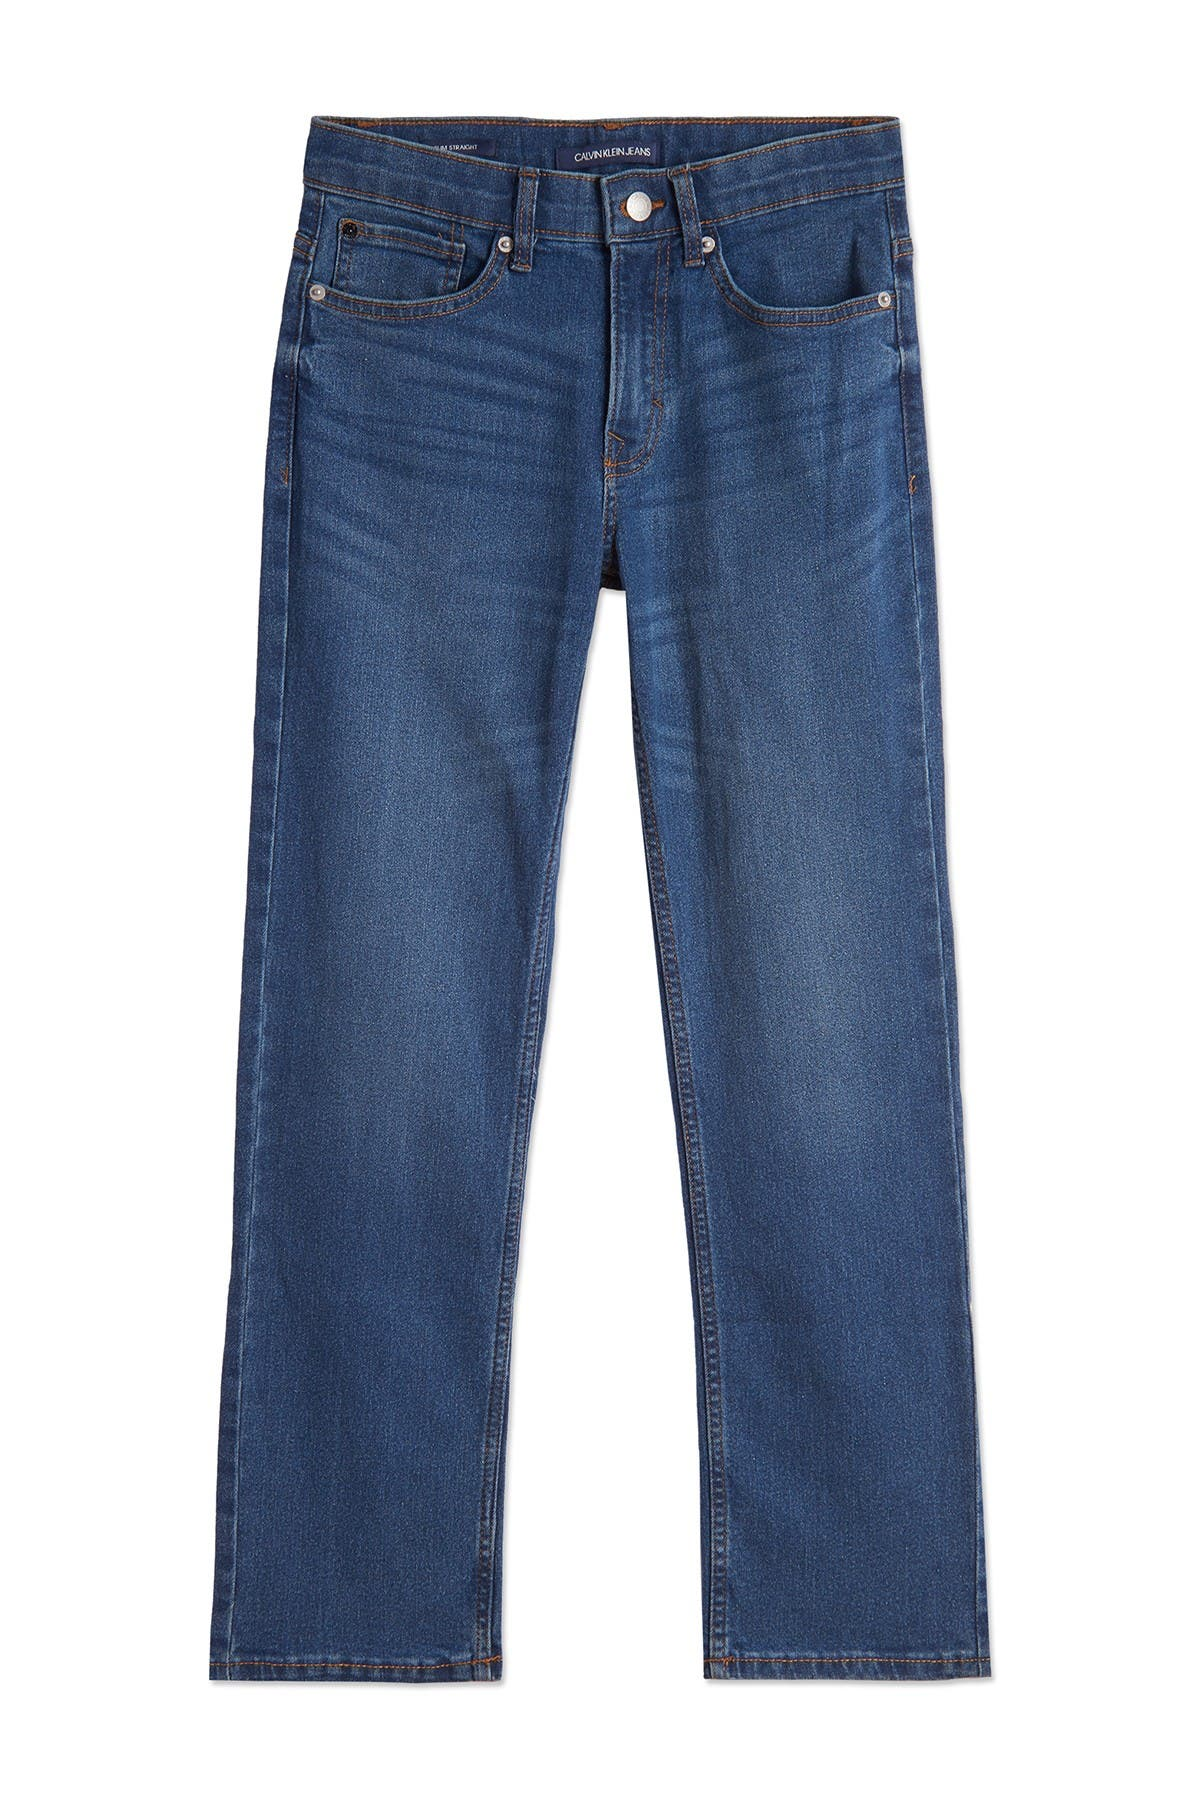 Image of Calvin Klein Slim Straight Denim Jeans